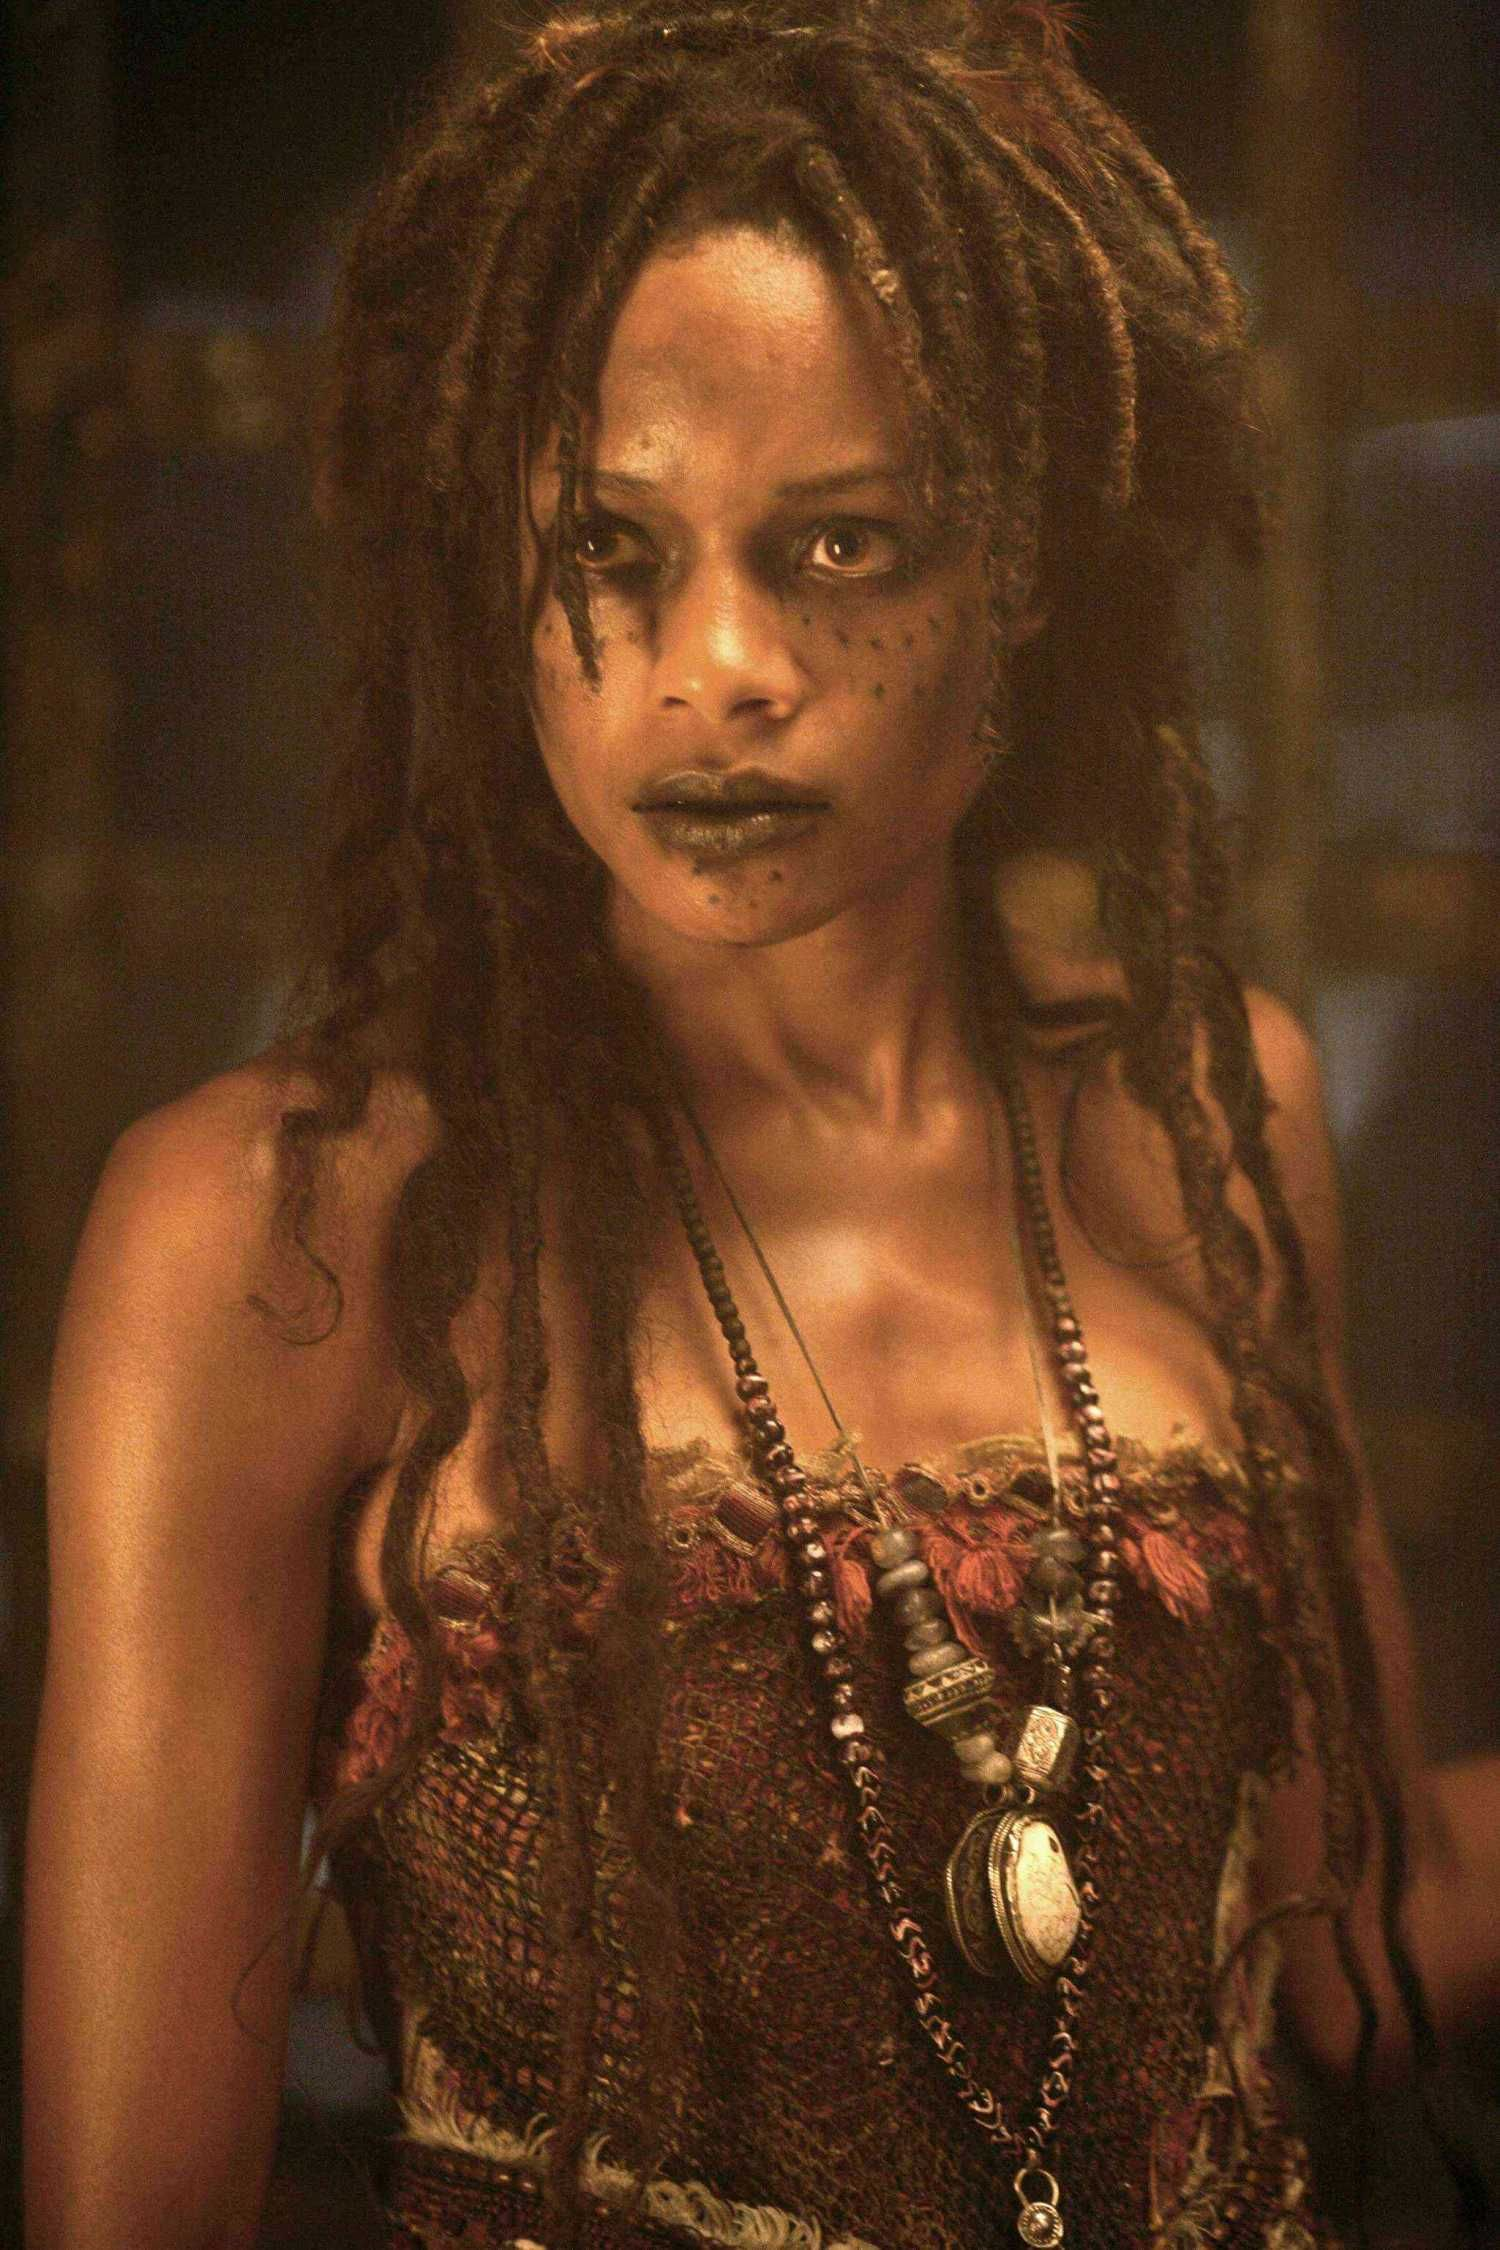 Pirates of the Caribbean - Tia Dalma | Halloween | Pinterest ...